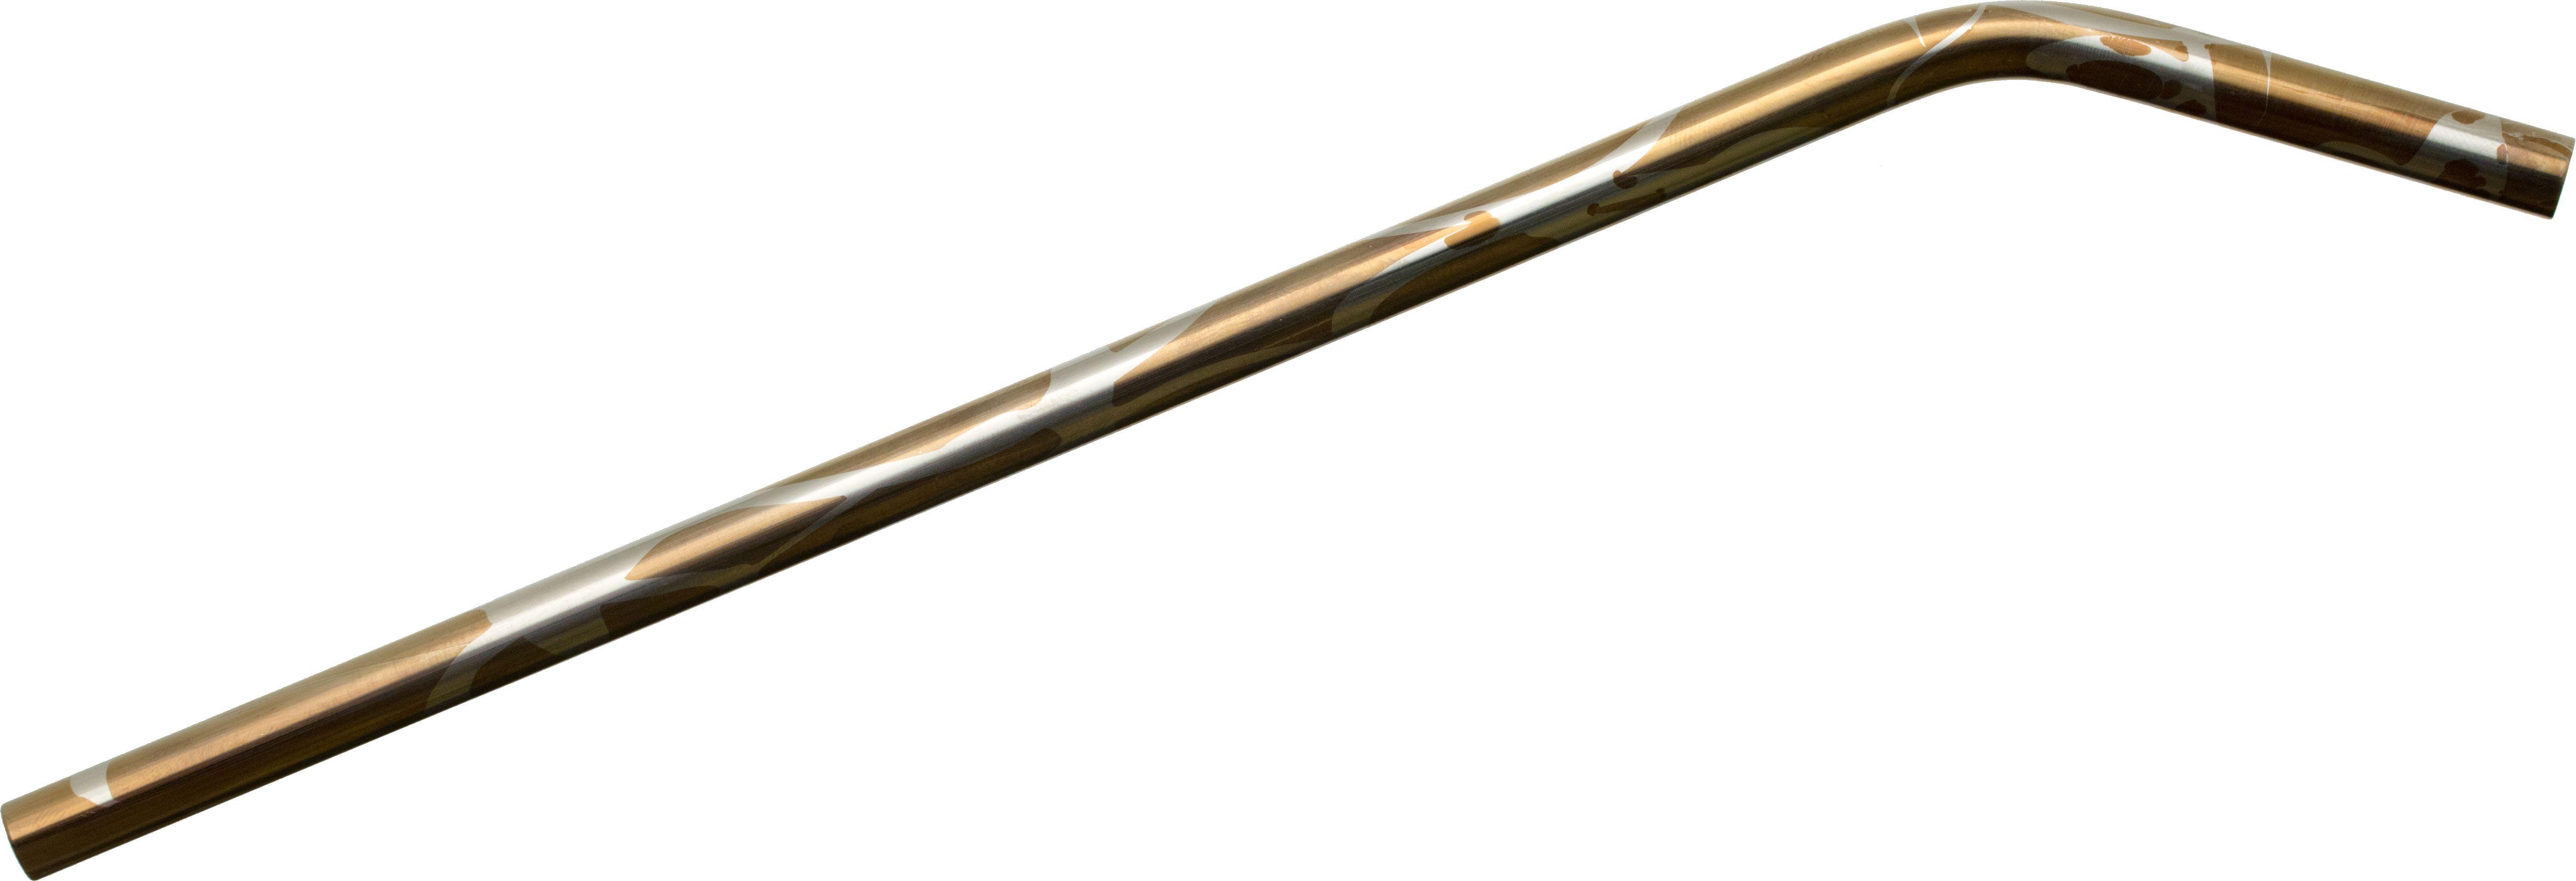 SK Knives Bronze Splash Anodized Bent Titanium Drinking Straw, 9.87 Overall